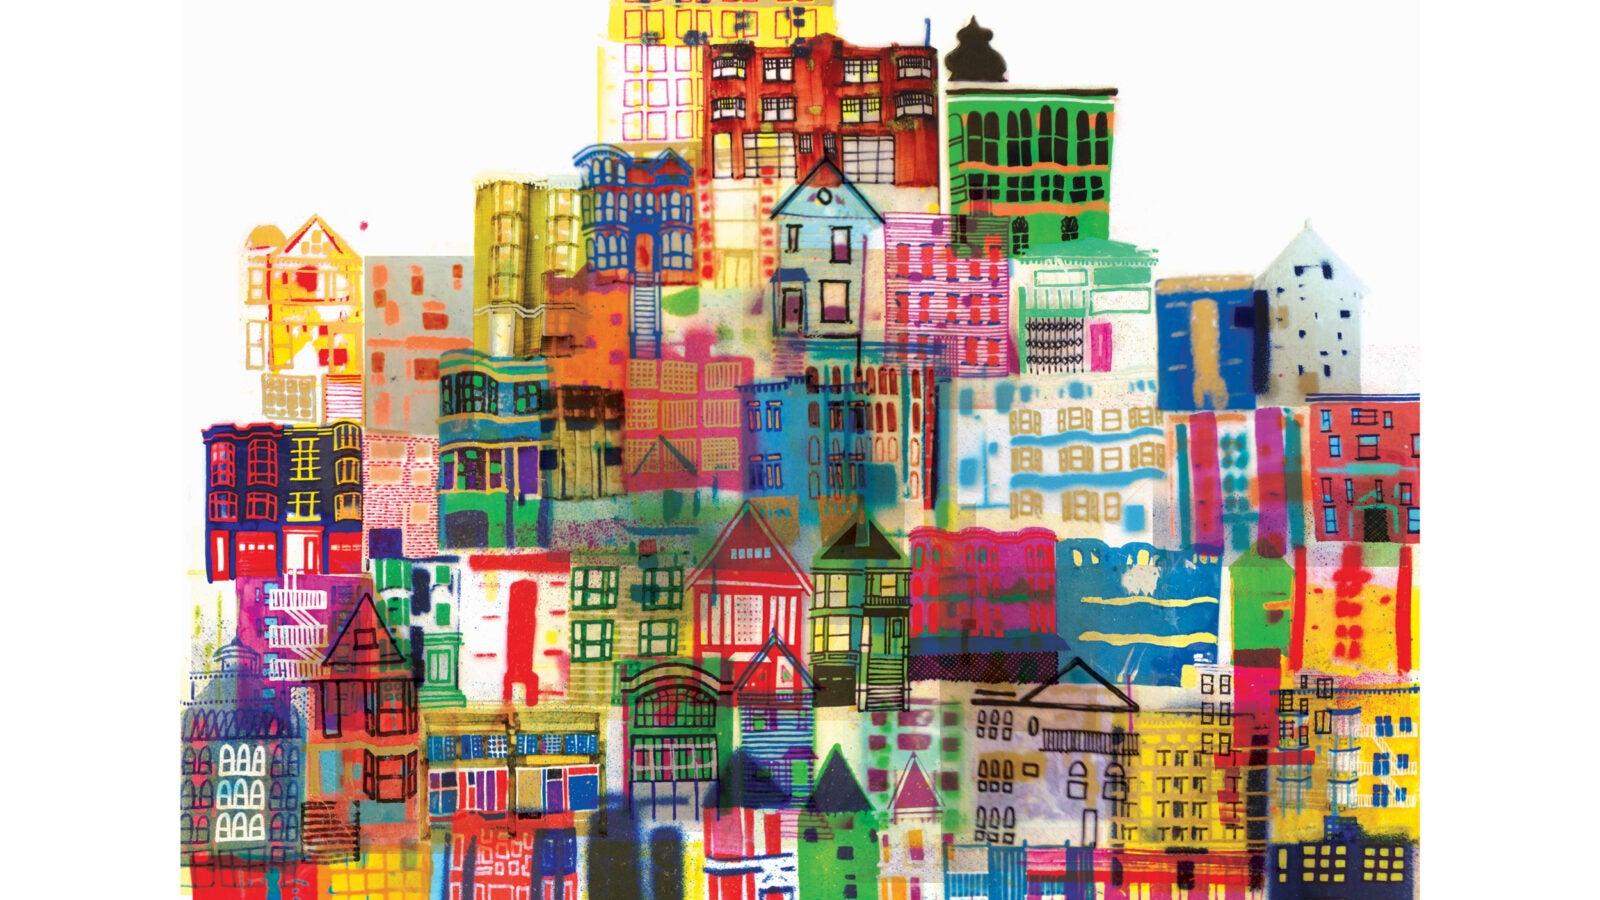 Illustration of bright multi-colored buildings.